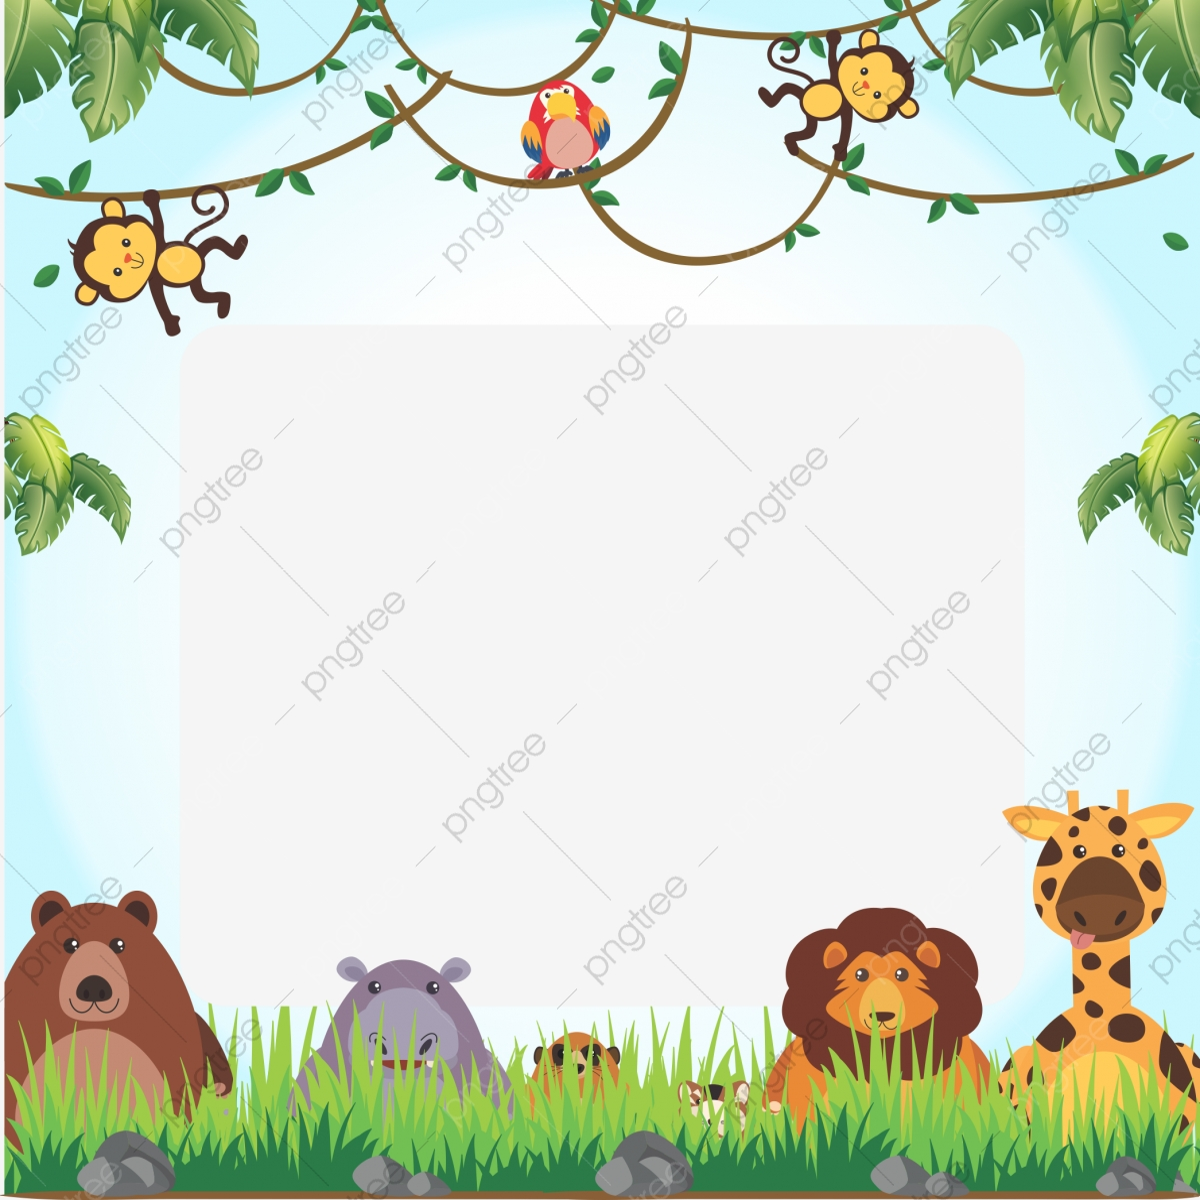 Safari Frame Safari Animal Frame Png Transparent Image And Clipart For Free Download